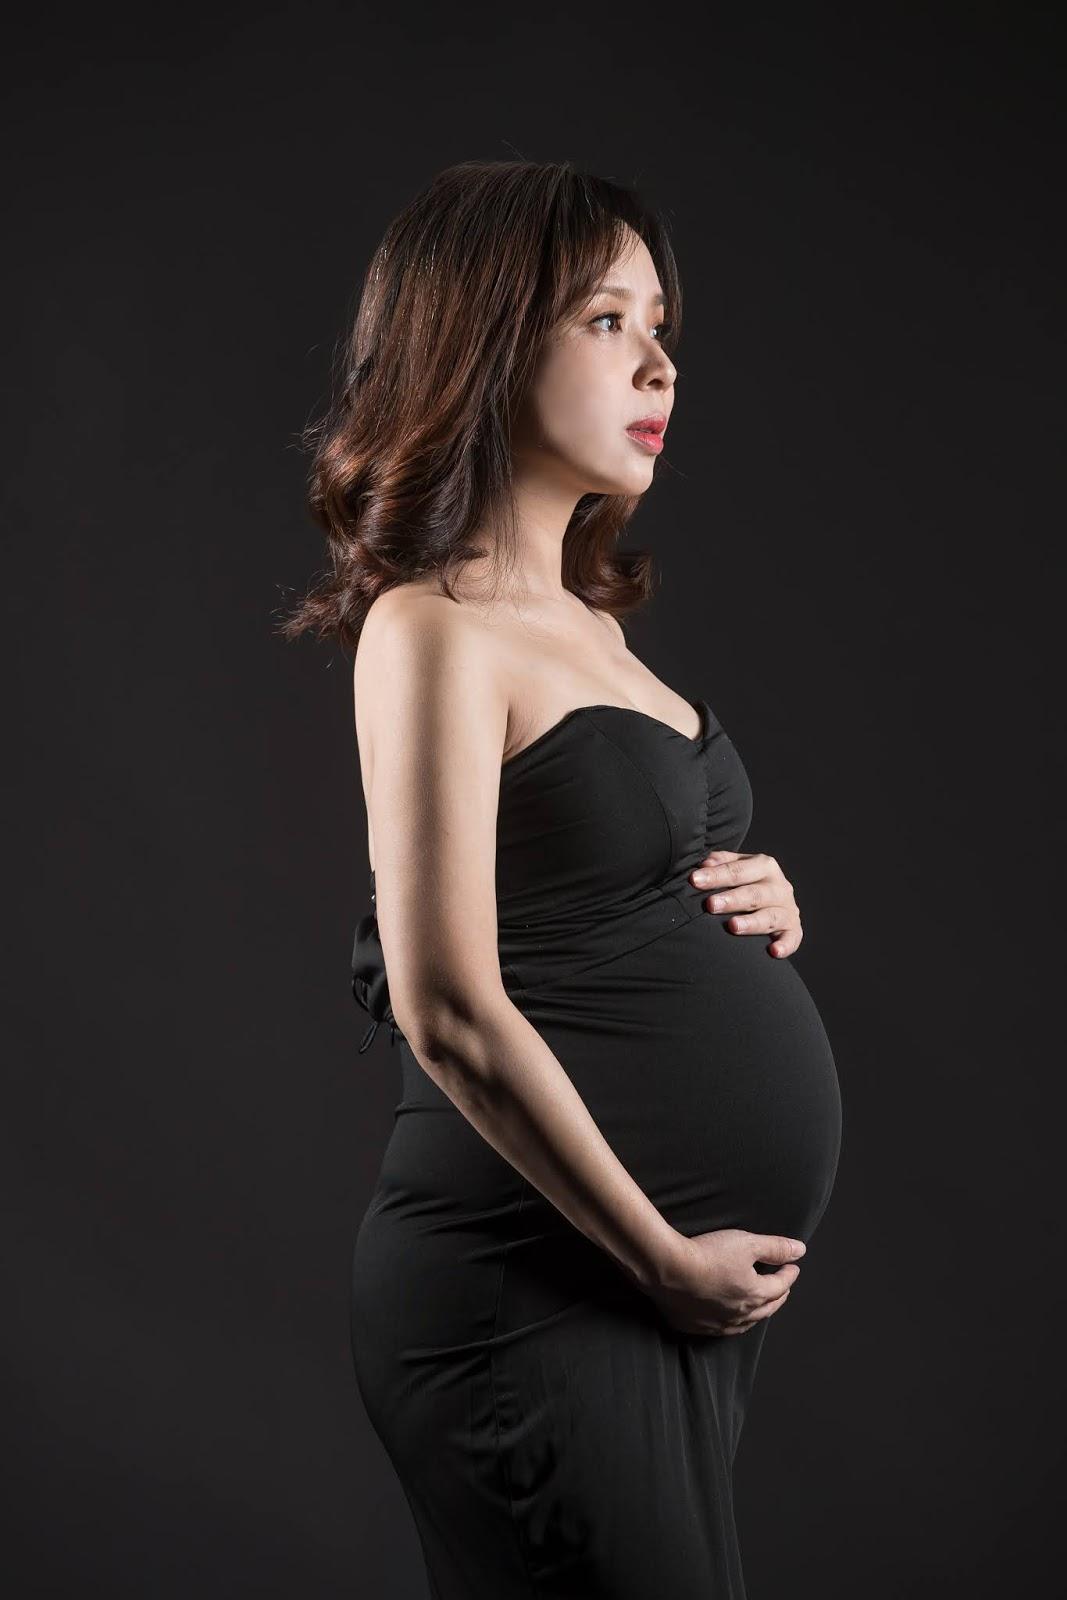 3.KIKI_AZ3I5928.jpg-懷孕,紀錄屬於妳的勇敢與美